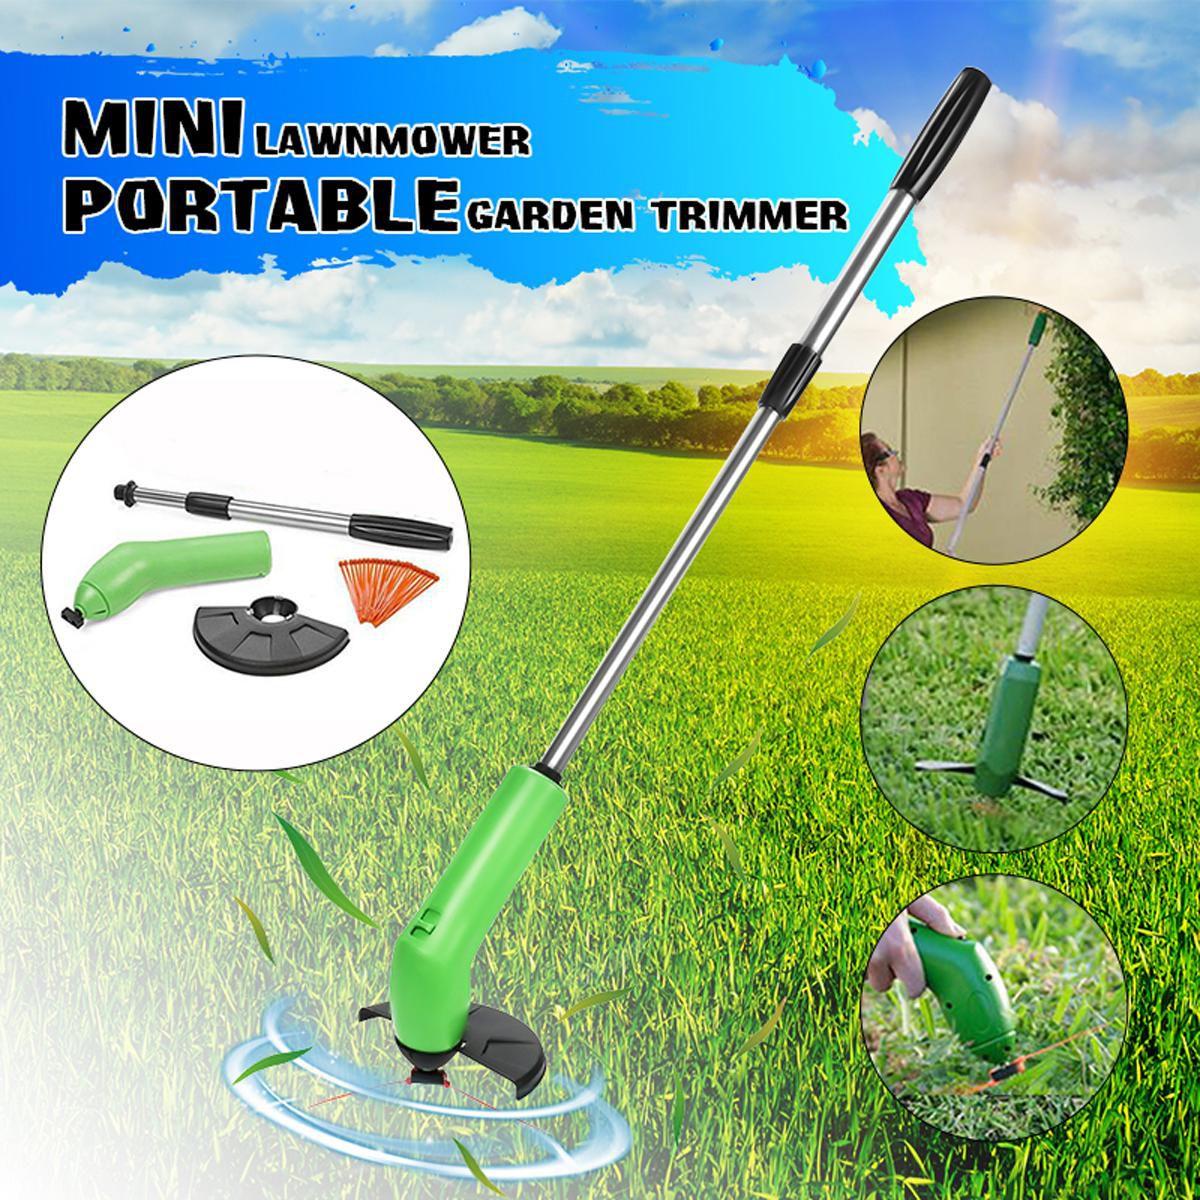 Mini Garden Zip Trim Portable Cordless Trimmer Lawn Mower Grass